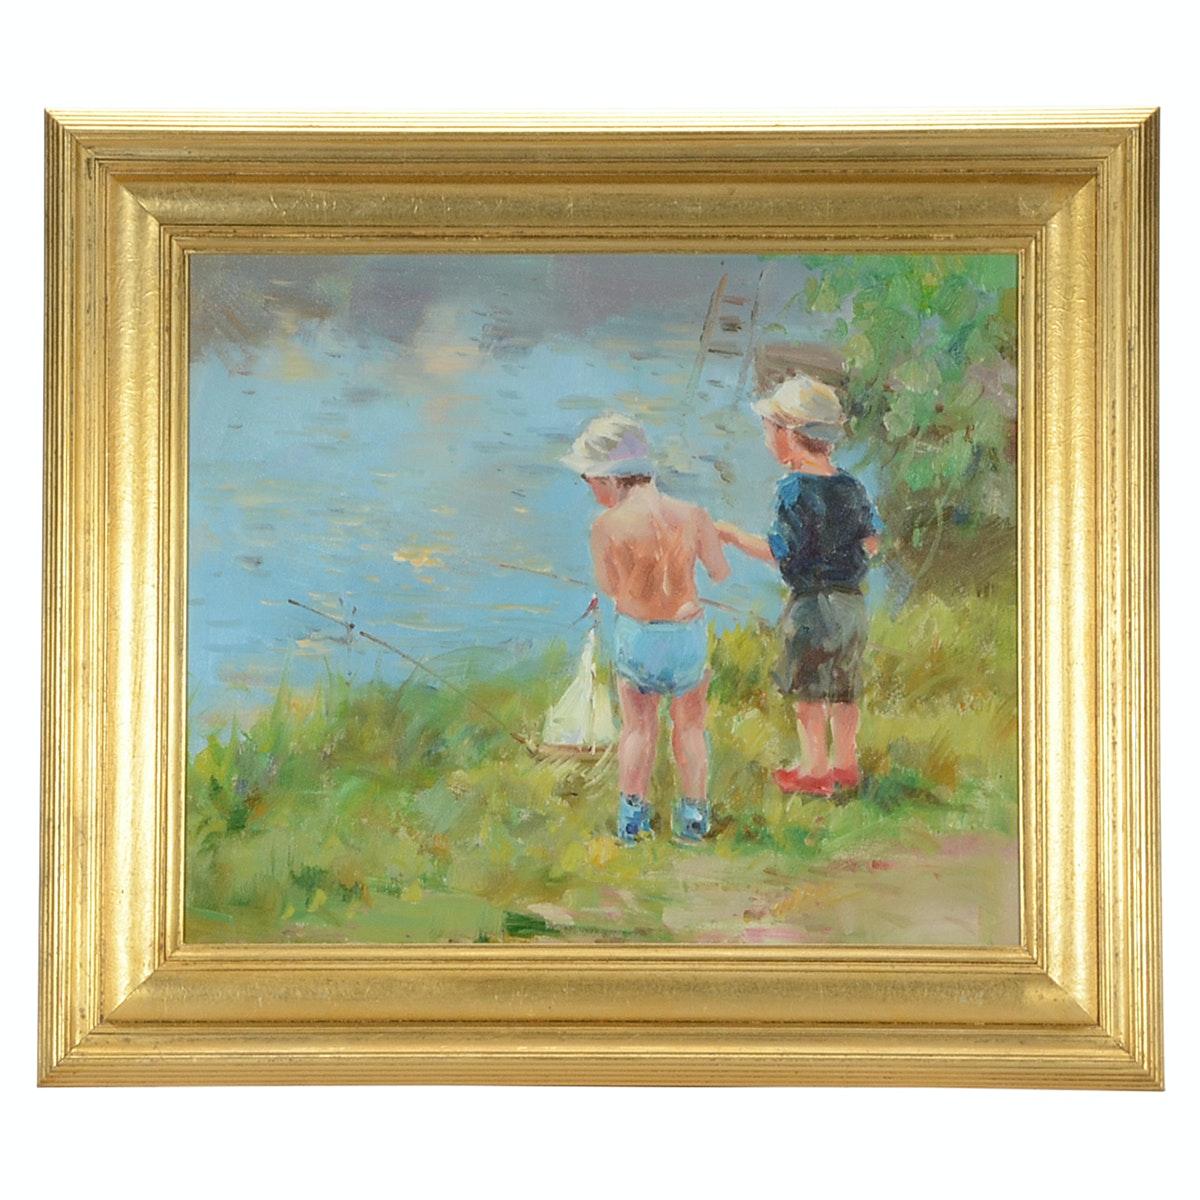 Original Contemporary Oil on Canvas